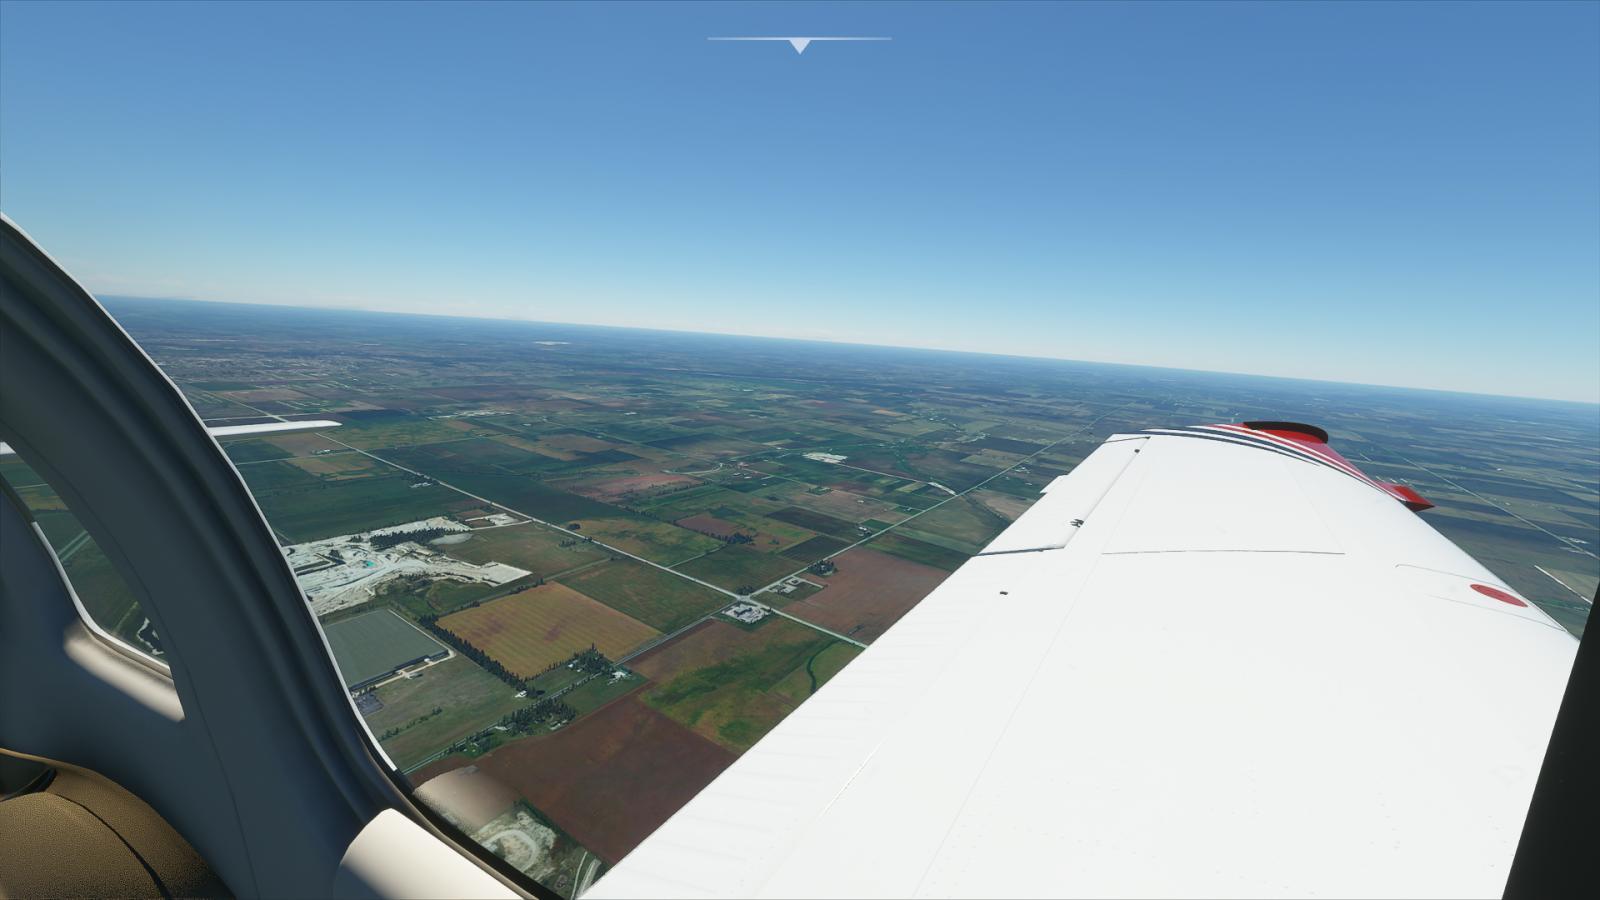 İsim:  Microsoft Flight Simulator Screenshot 2020.08.21 - 23.00.54.37.jpg Görüntüleme: 120 Büyüklük:  99.3 KB (Kilobyte)